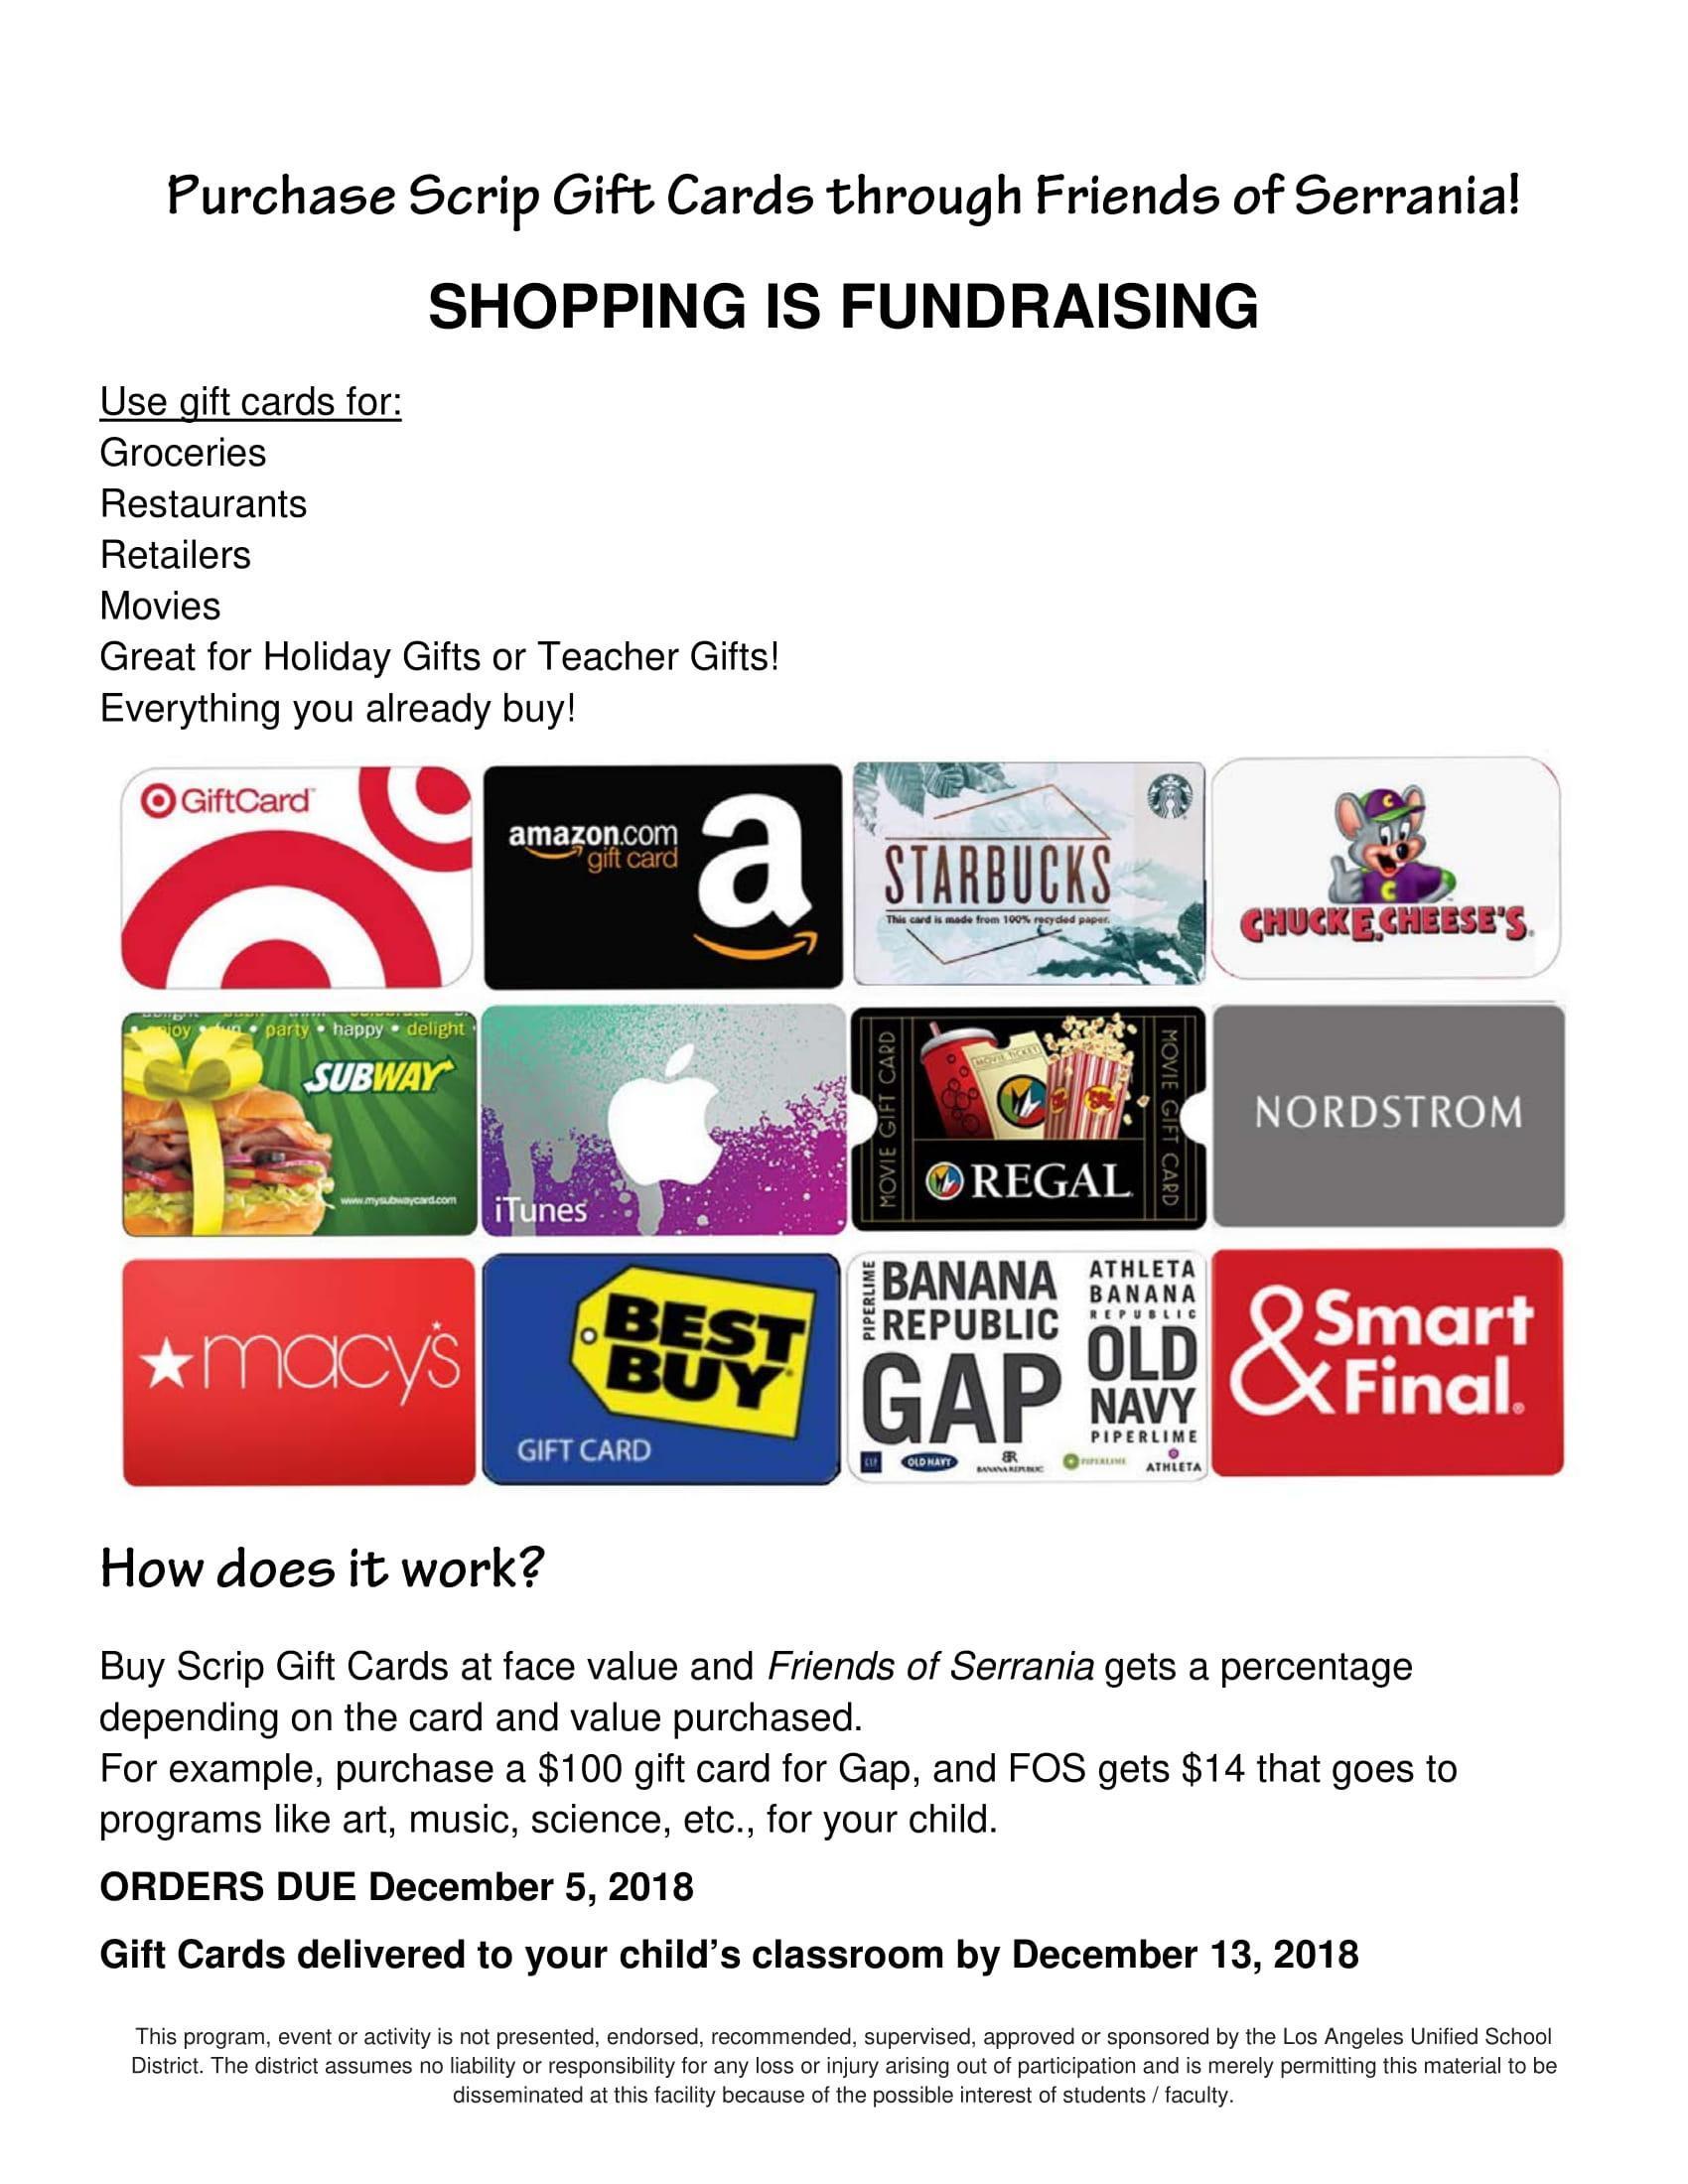 Purchase Scrip Gift Cards through FOS-1.jpg